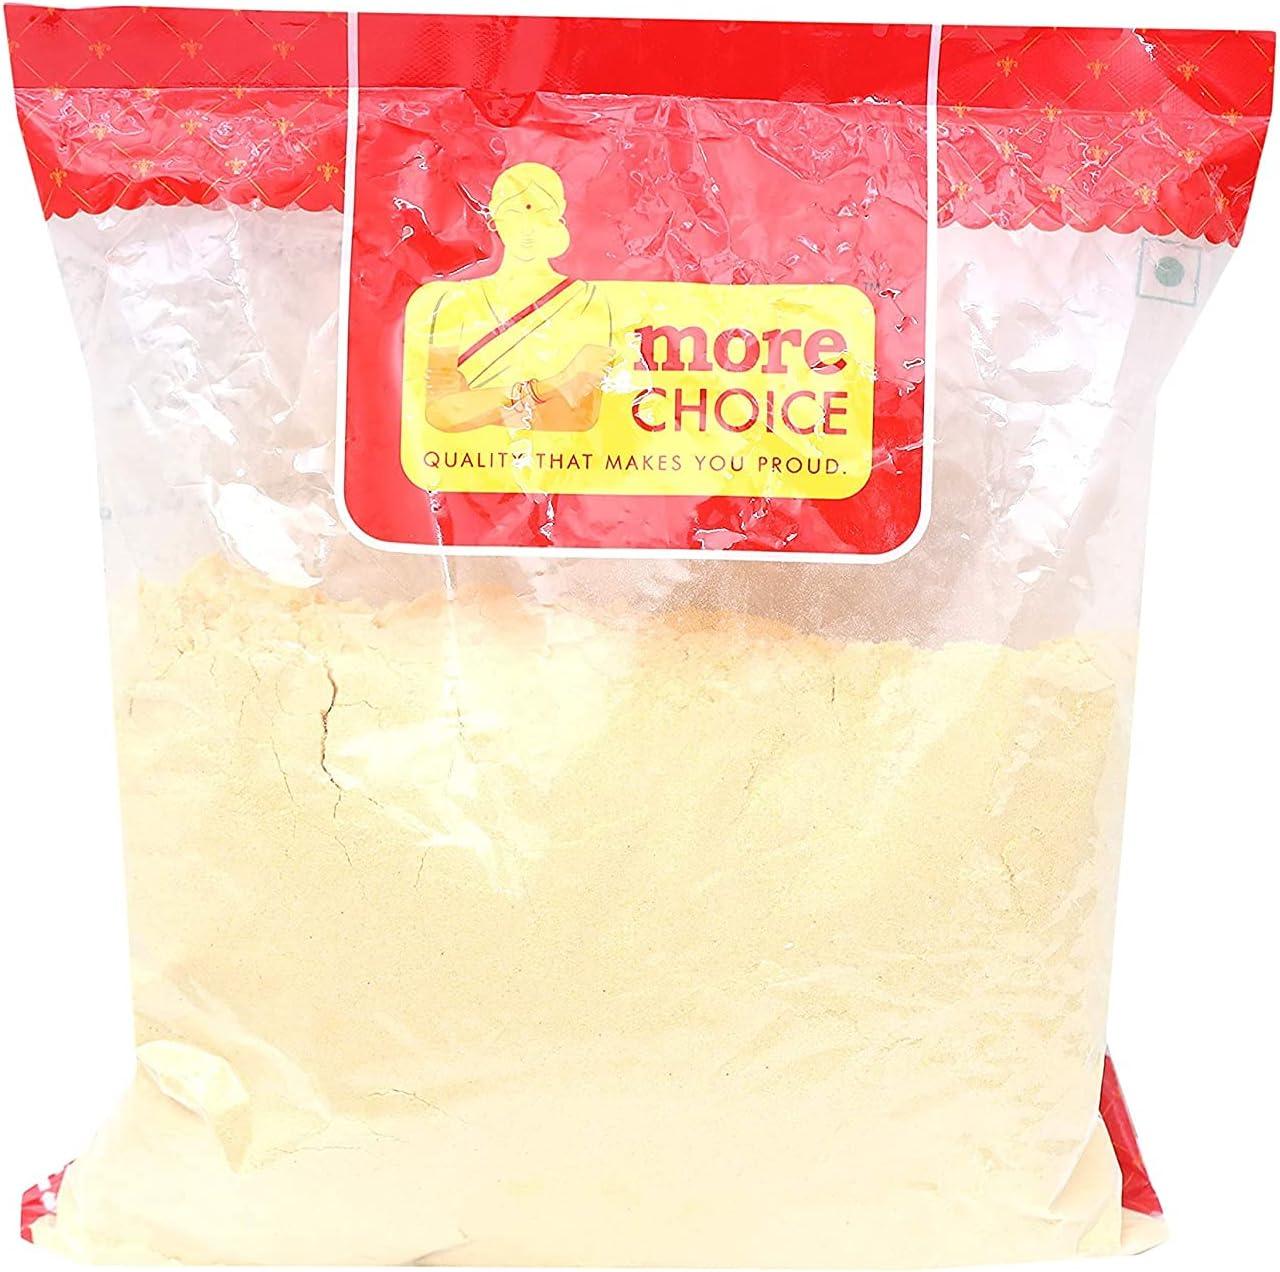 A surprise price is realized Brianna More Choice Superior Flour - Lowest price challenge Atta Makki 1kg Maize Pou